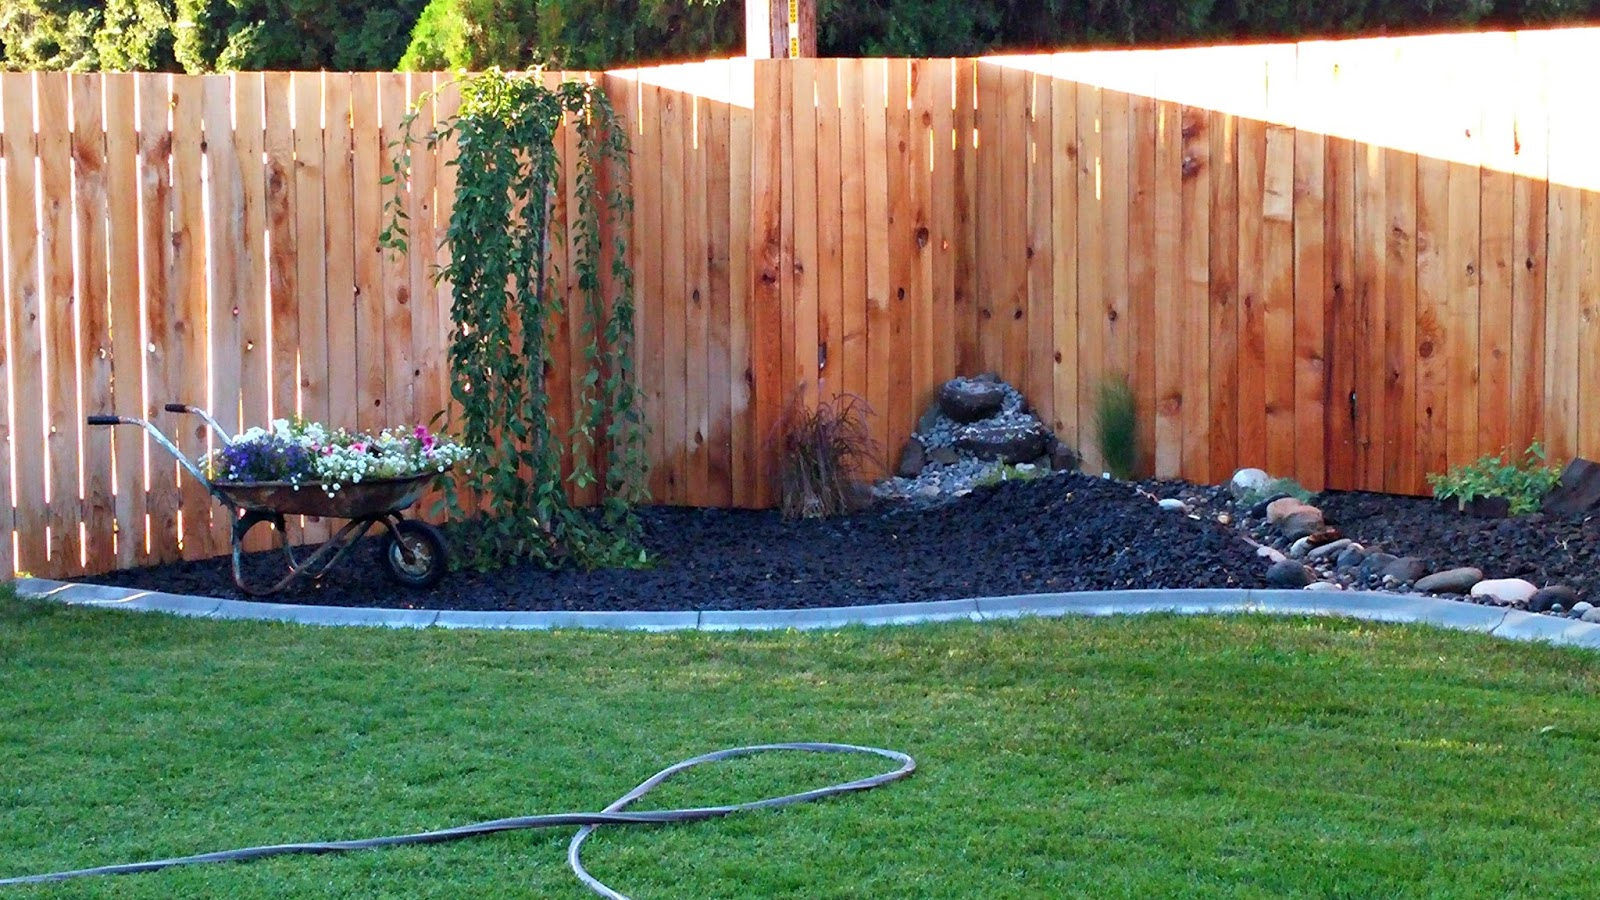 backyard landscaping progress dry river bed weekend yard work